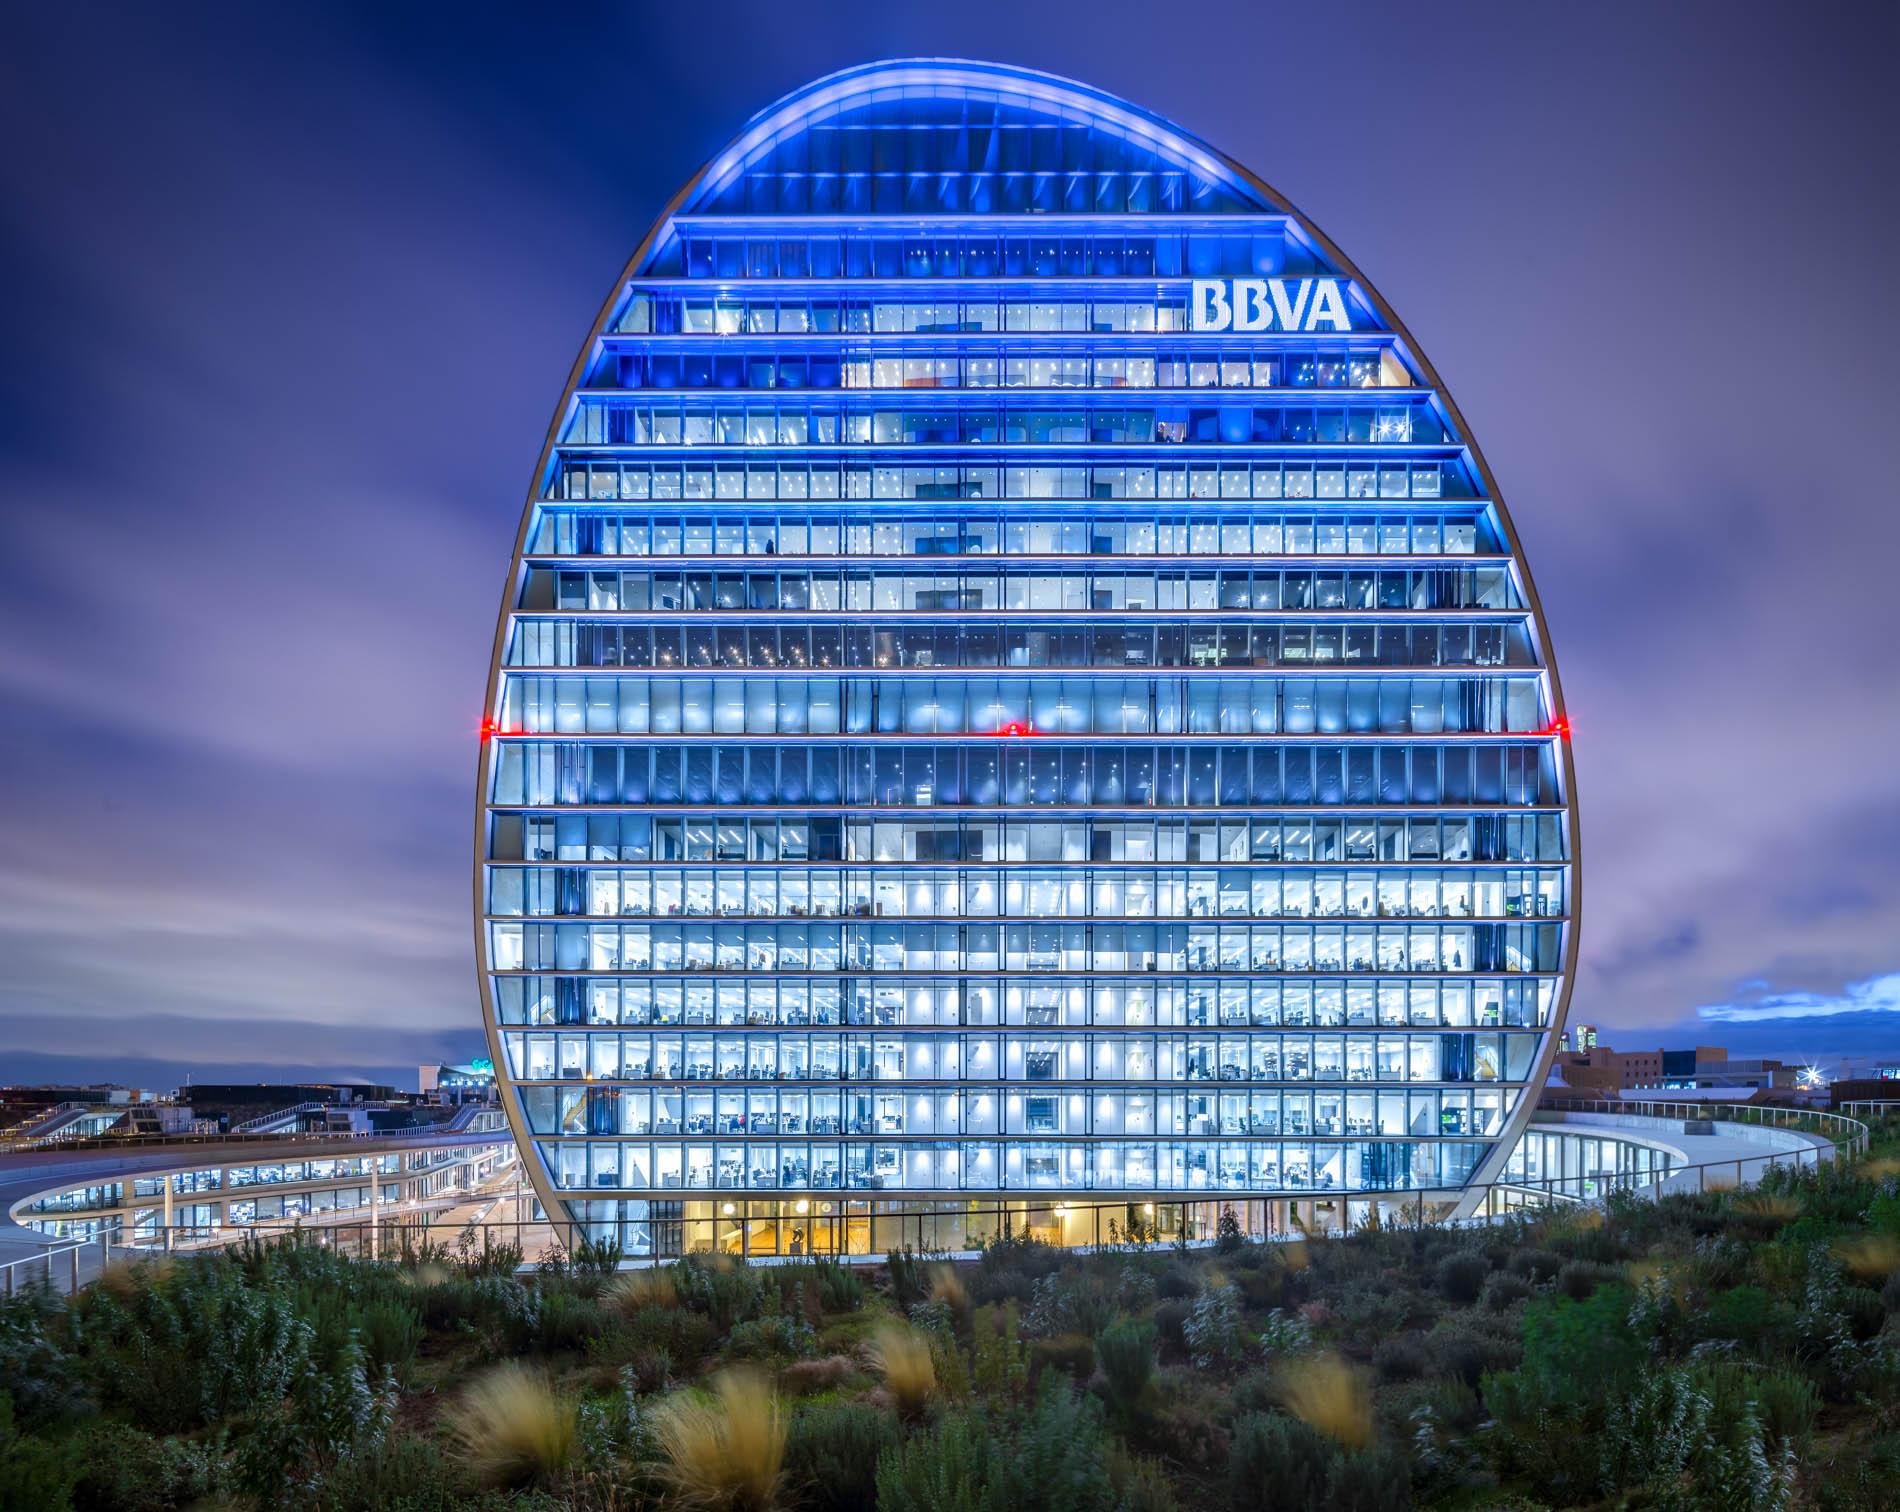 https://shareholdersandinvestors.bbva.com/wp-content/uploads/2019/04/16.-La-Vela-Ciudad-BBVA.jpg